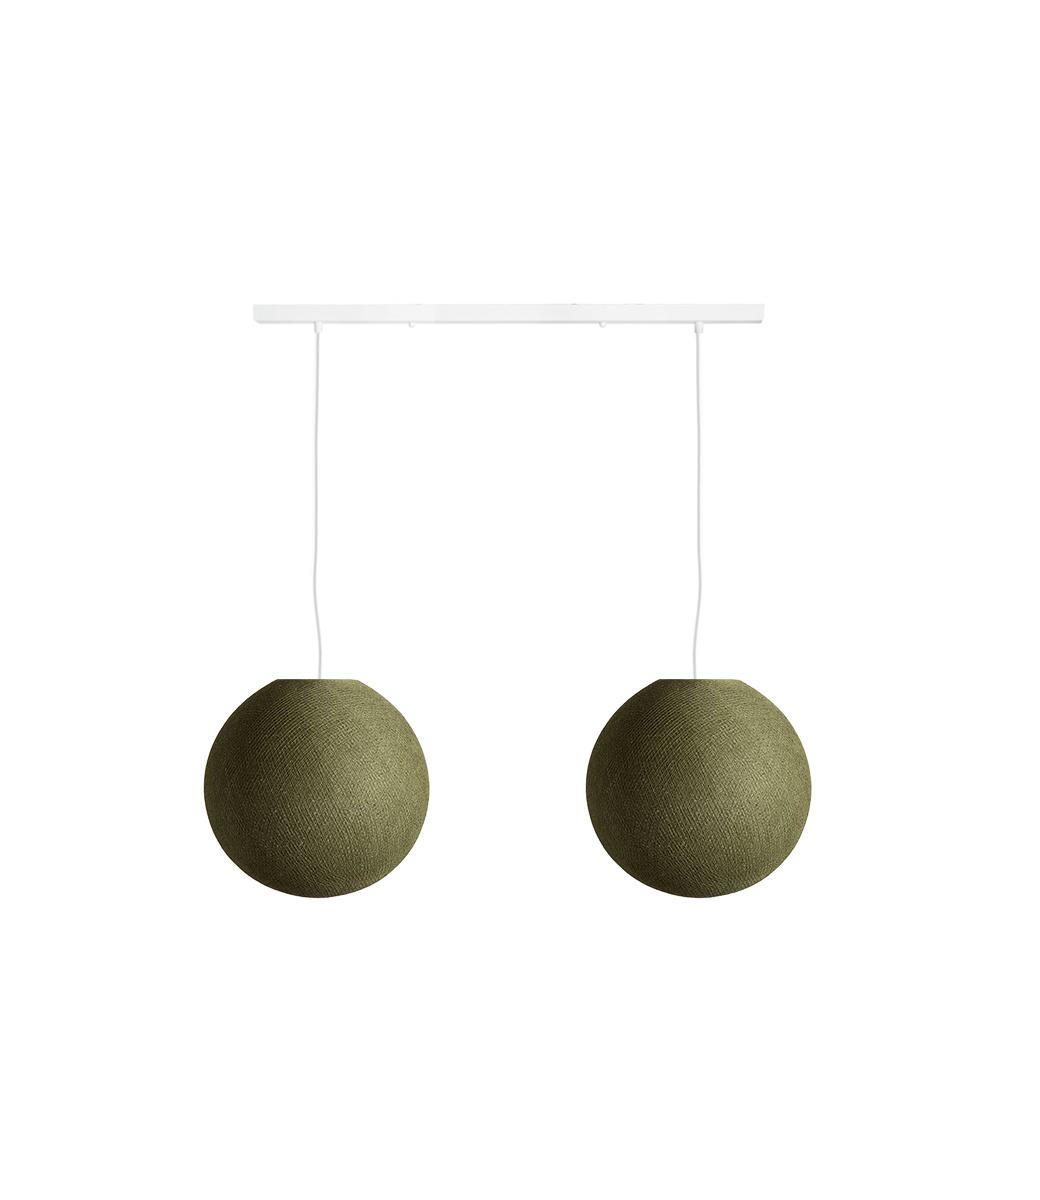 Cotton Ball Lights Tweevoudige hanglamp balk - Kaki